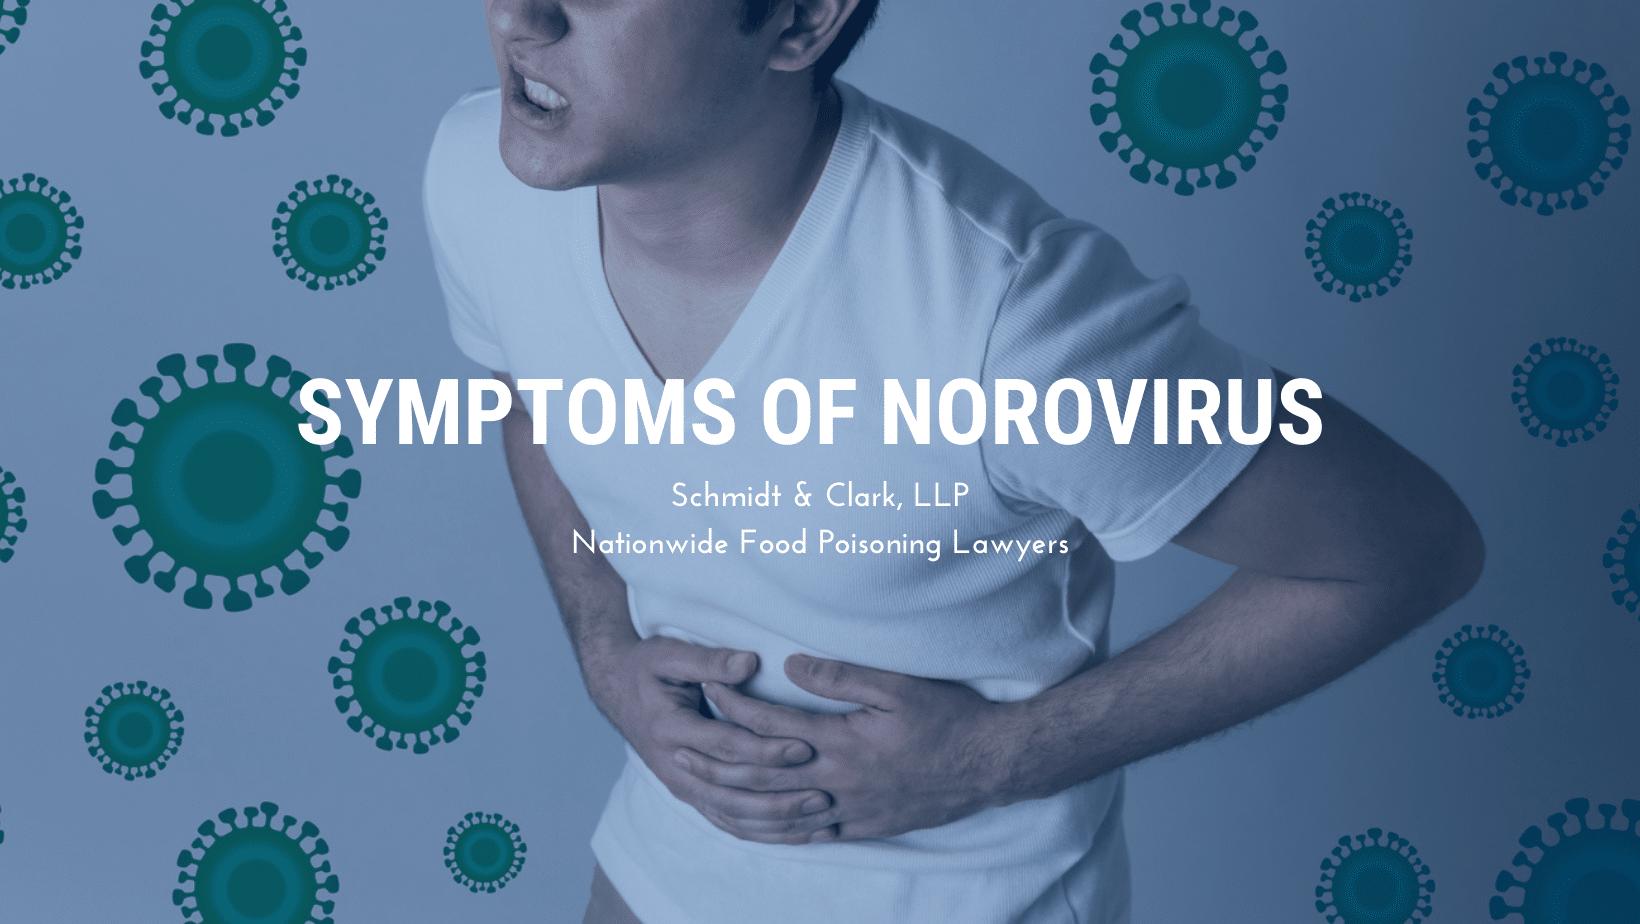 Symptoms of Norovirus